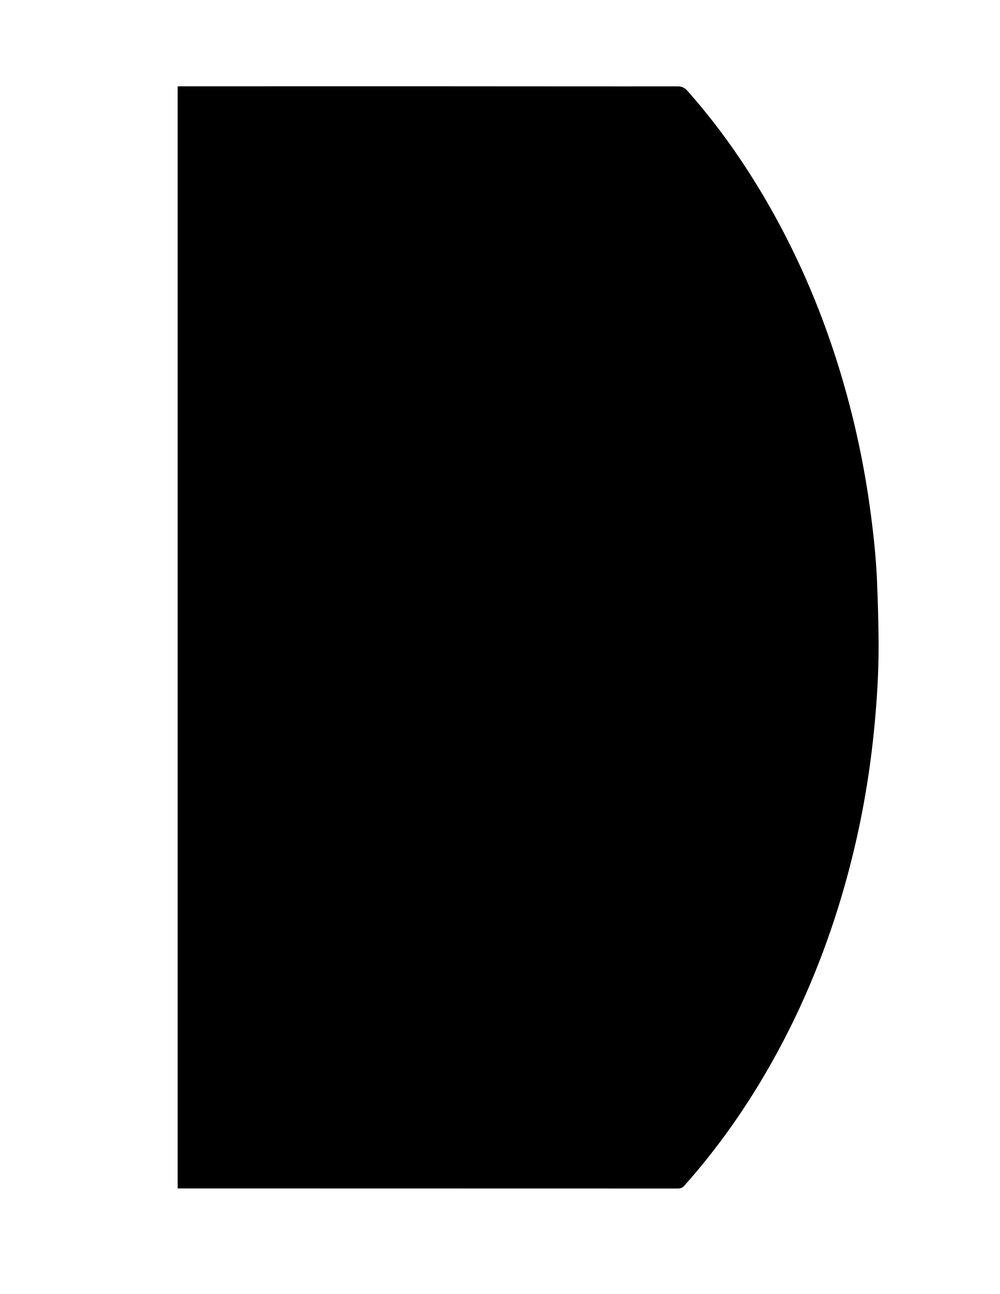 https://static1.squarespace.com/static/5148aa1de4b016fef442df9a/58115d5a03596e29c7dc6825/58115d5a59cc683fcb010f33/1477533136294/halloween+flyout+template+black.jpg?format=1000w